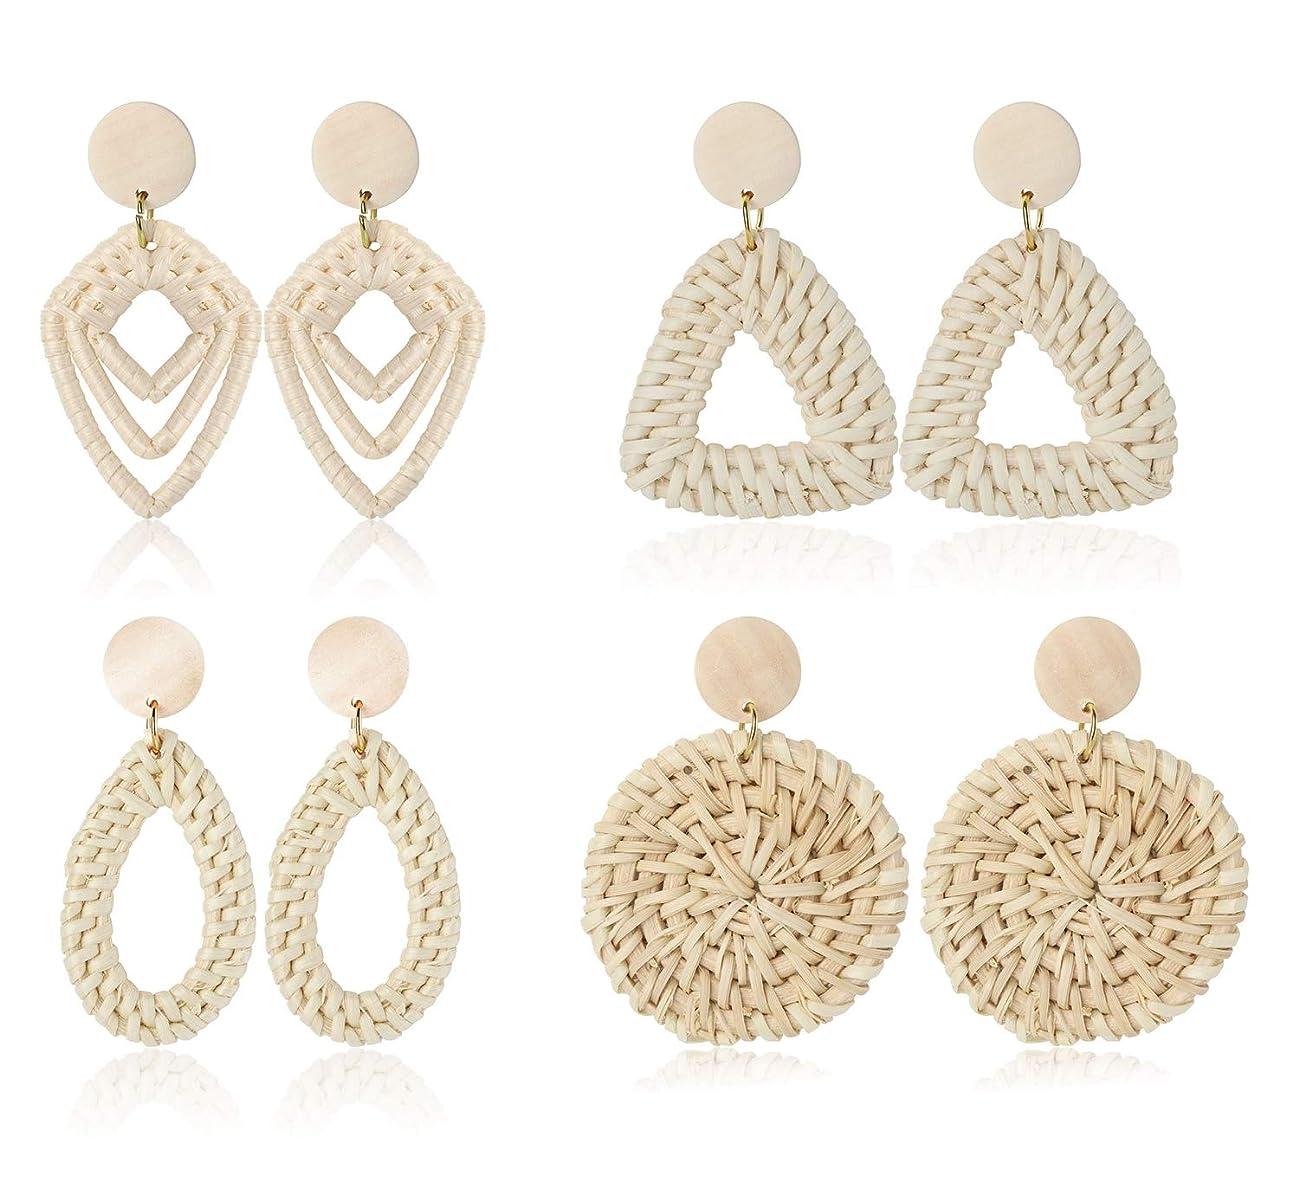 Finrezio 4 Pairs Rattan Dangle Earrings for Women Lightweight Bohemia Straw Wicker Braid Woven Geometric?Statement Earring Set Handmade Jewelry (A:Nature Beige)